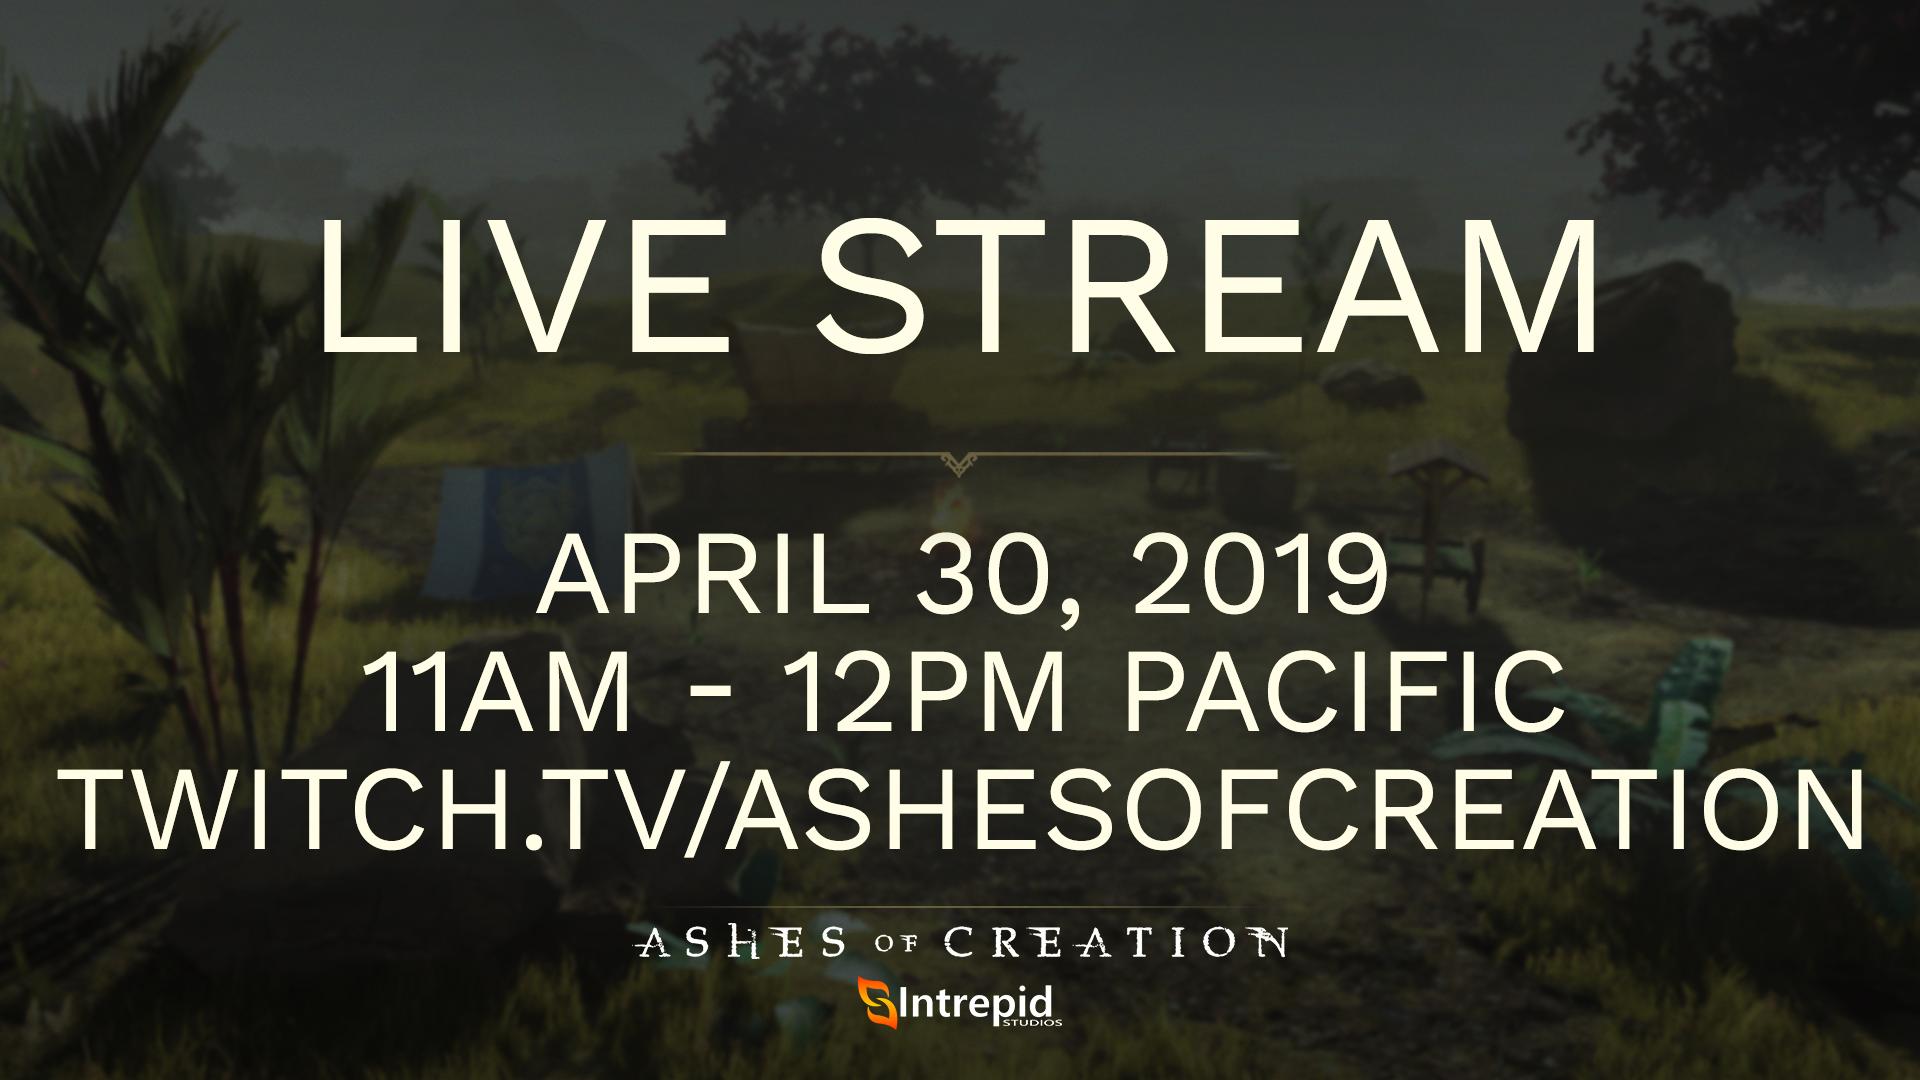 2019_04_30_LiveStream_-_Social_Media_Post_Asset.png